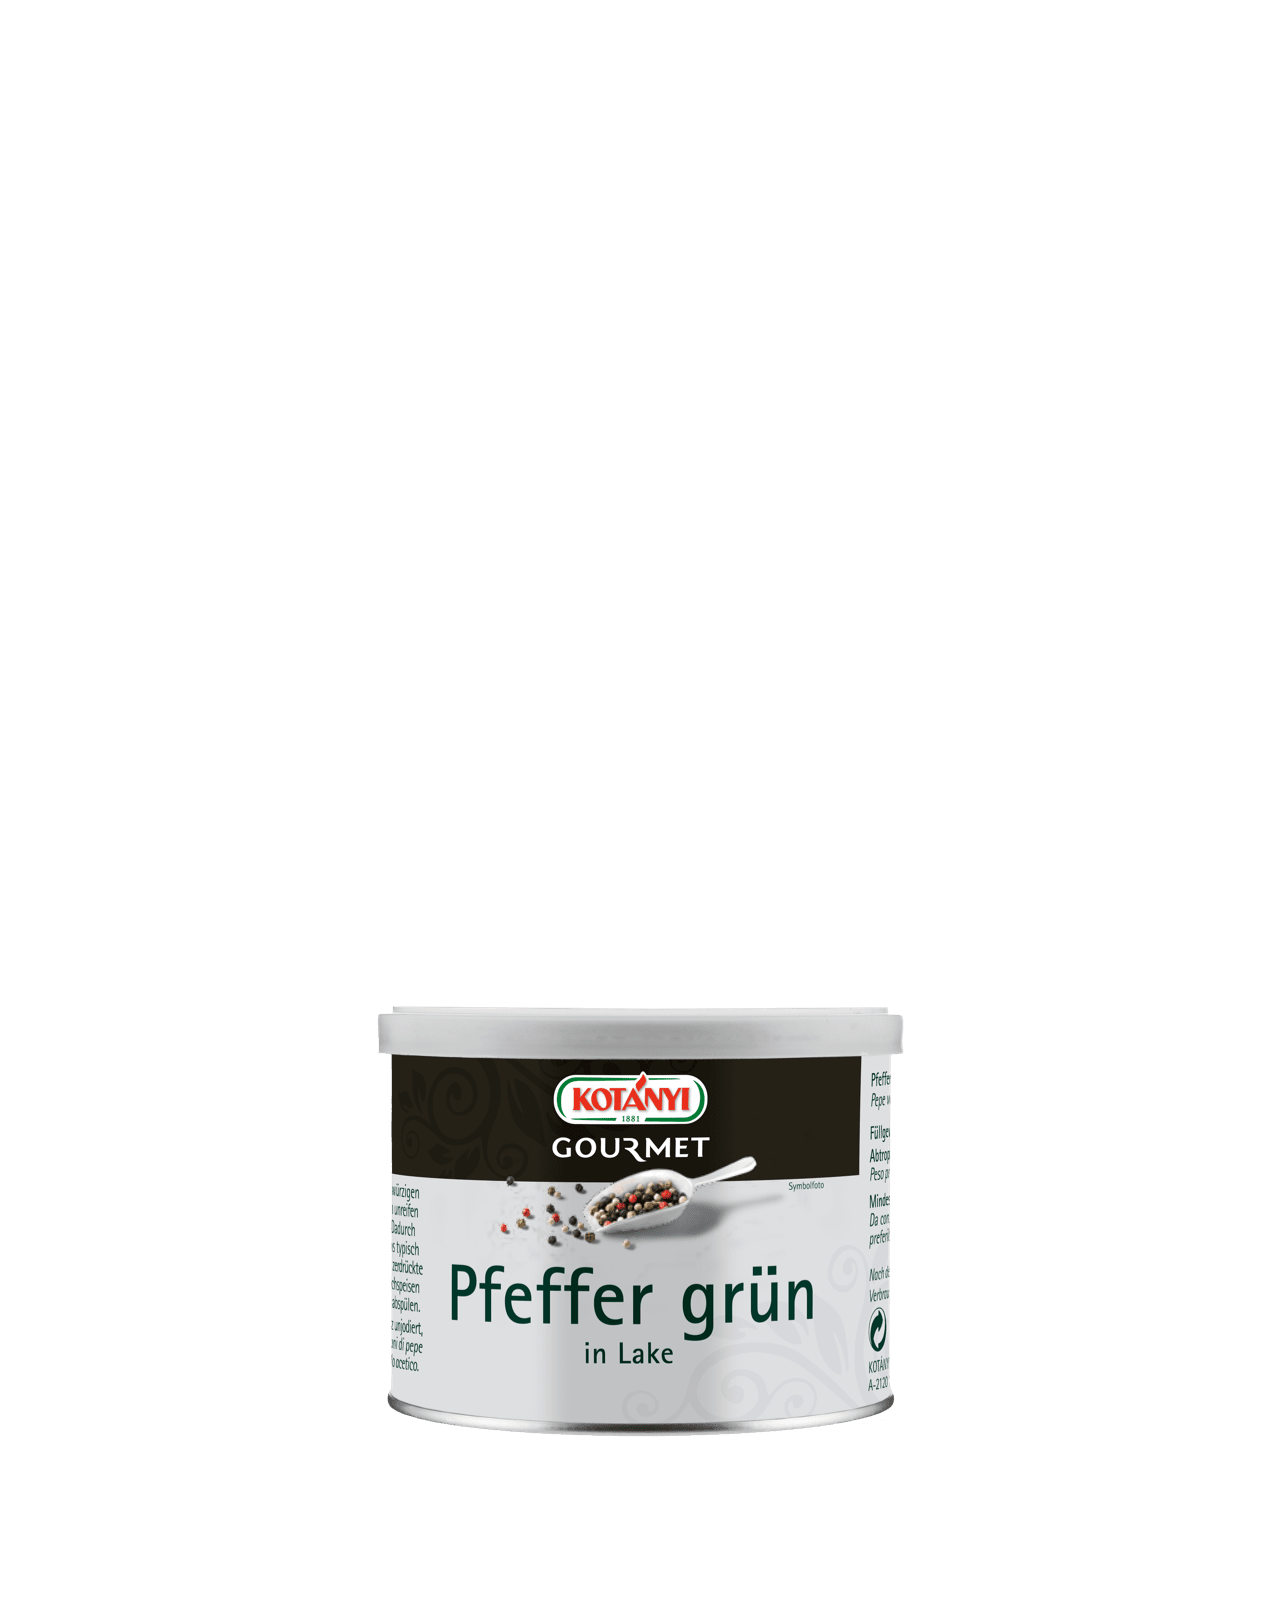 Pfefferkoerner Gruen In Lake Kotanyi Gourmet 100g Konserve 500201